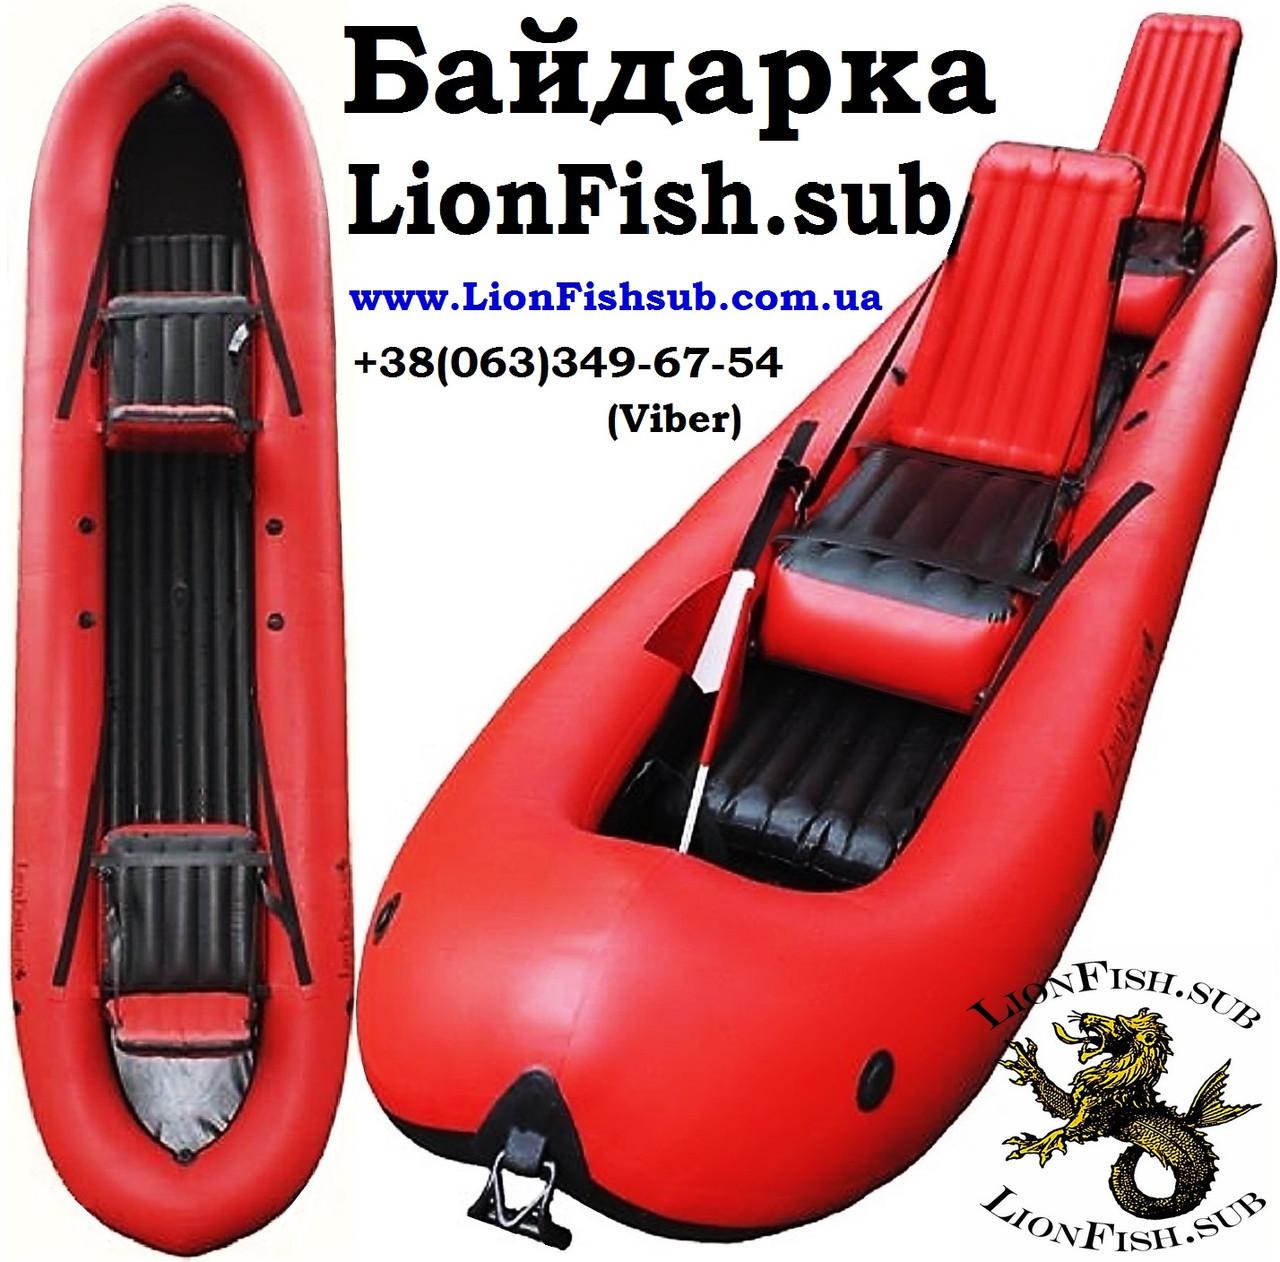 Байдарка LionFish.sub (Kayak) из ПВХ